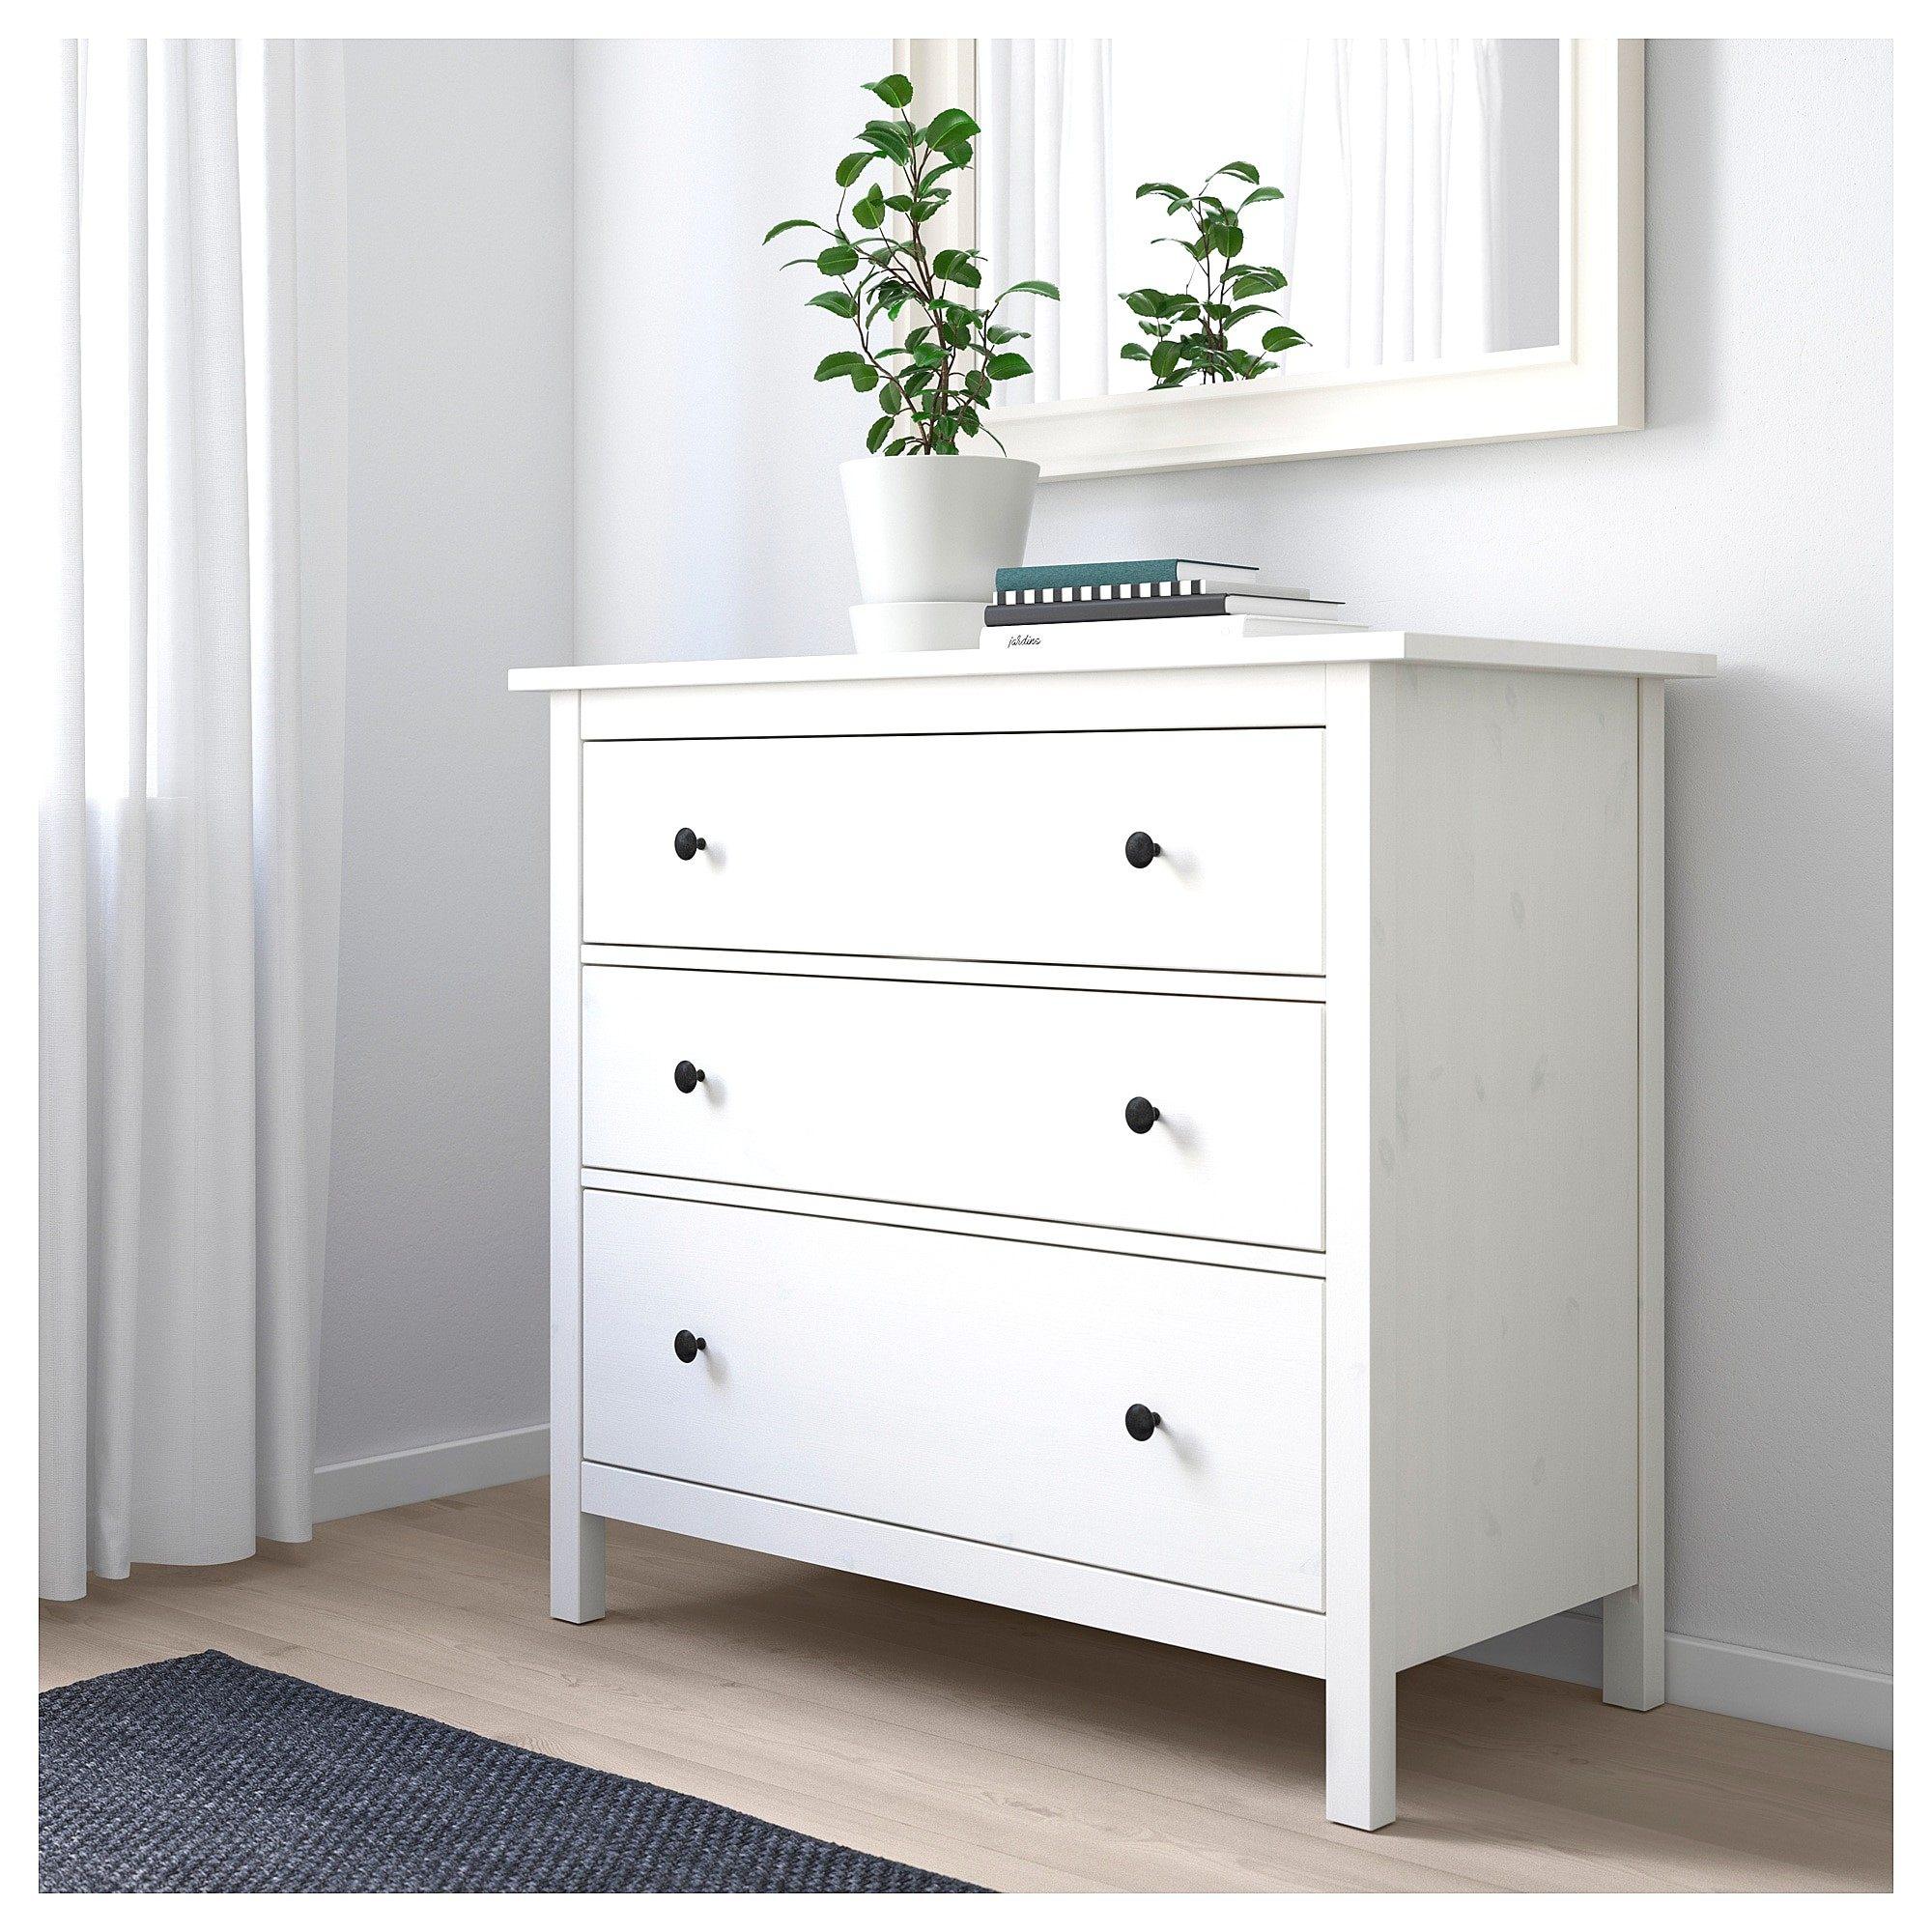 linge de lit en lin lav meilleur de ikea mode hemnes 3. Black Bedroom Furniture Sets. Home Design Ideas